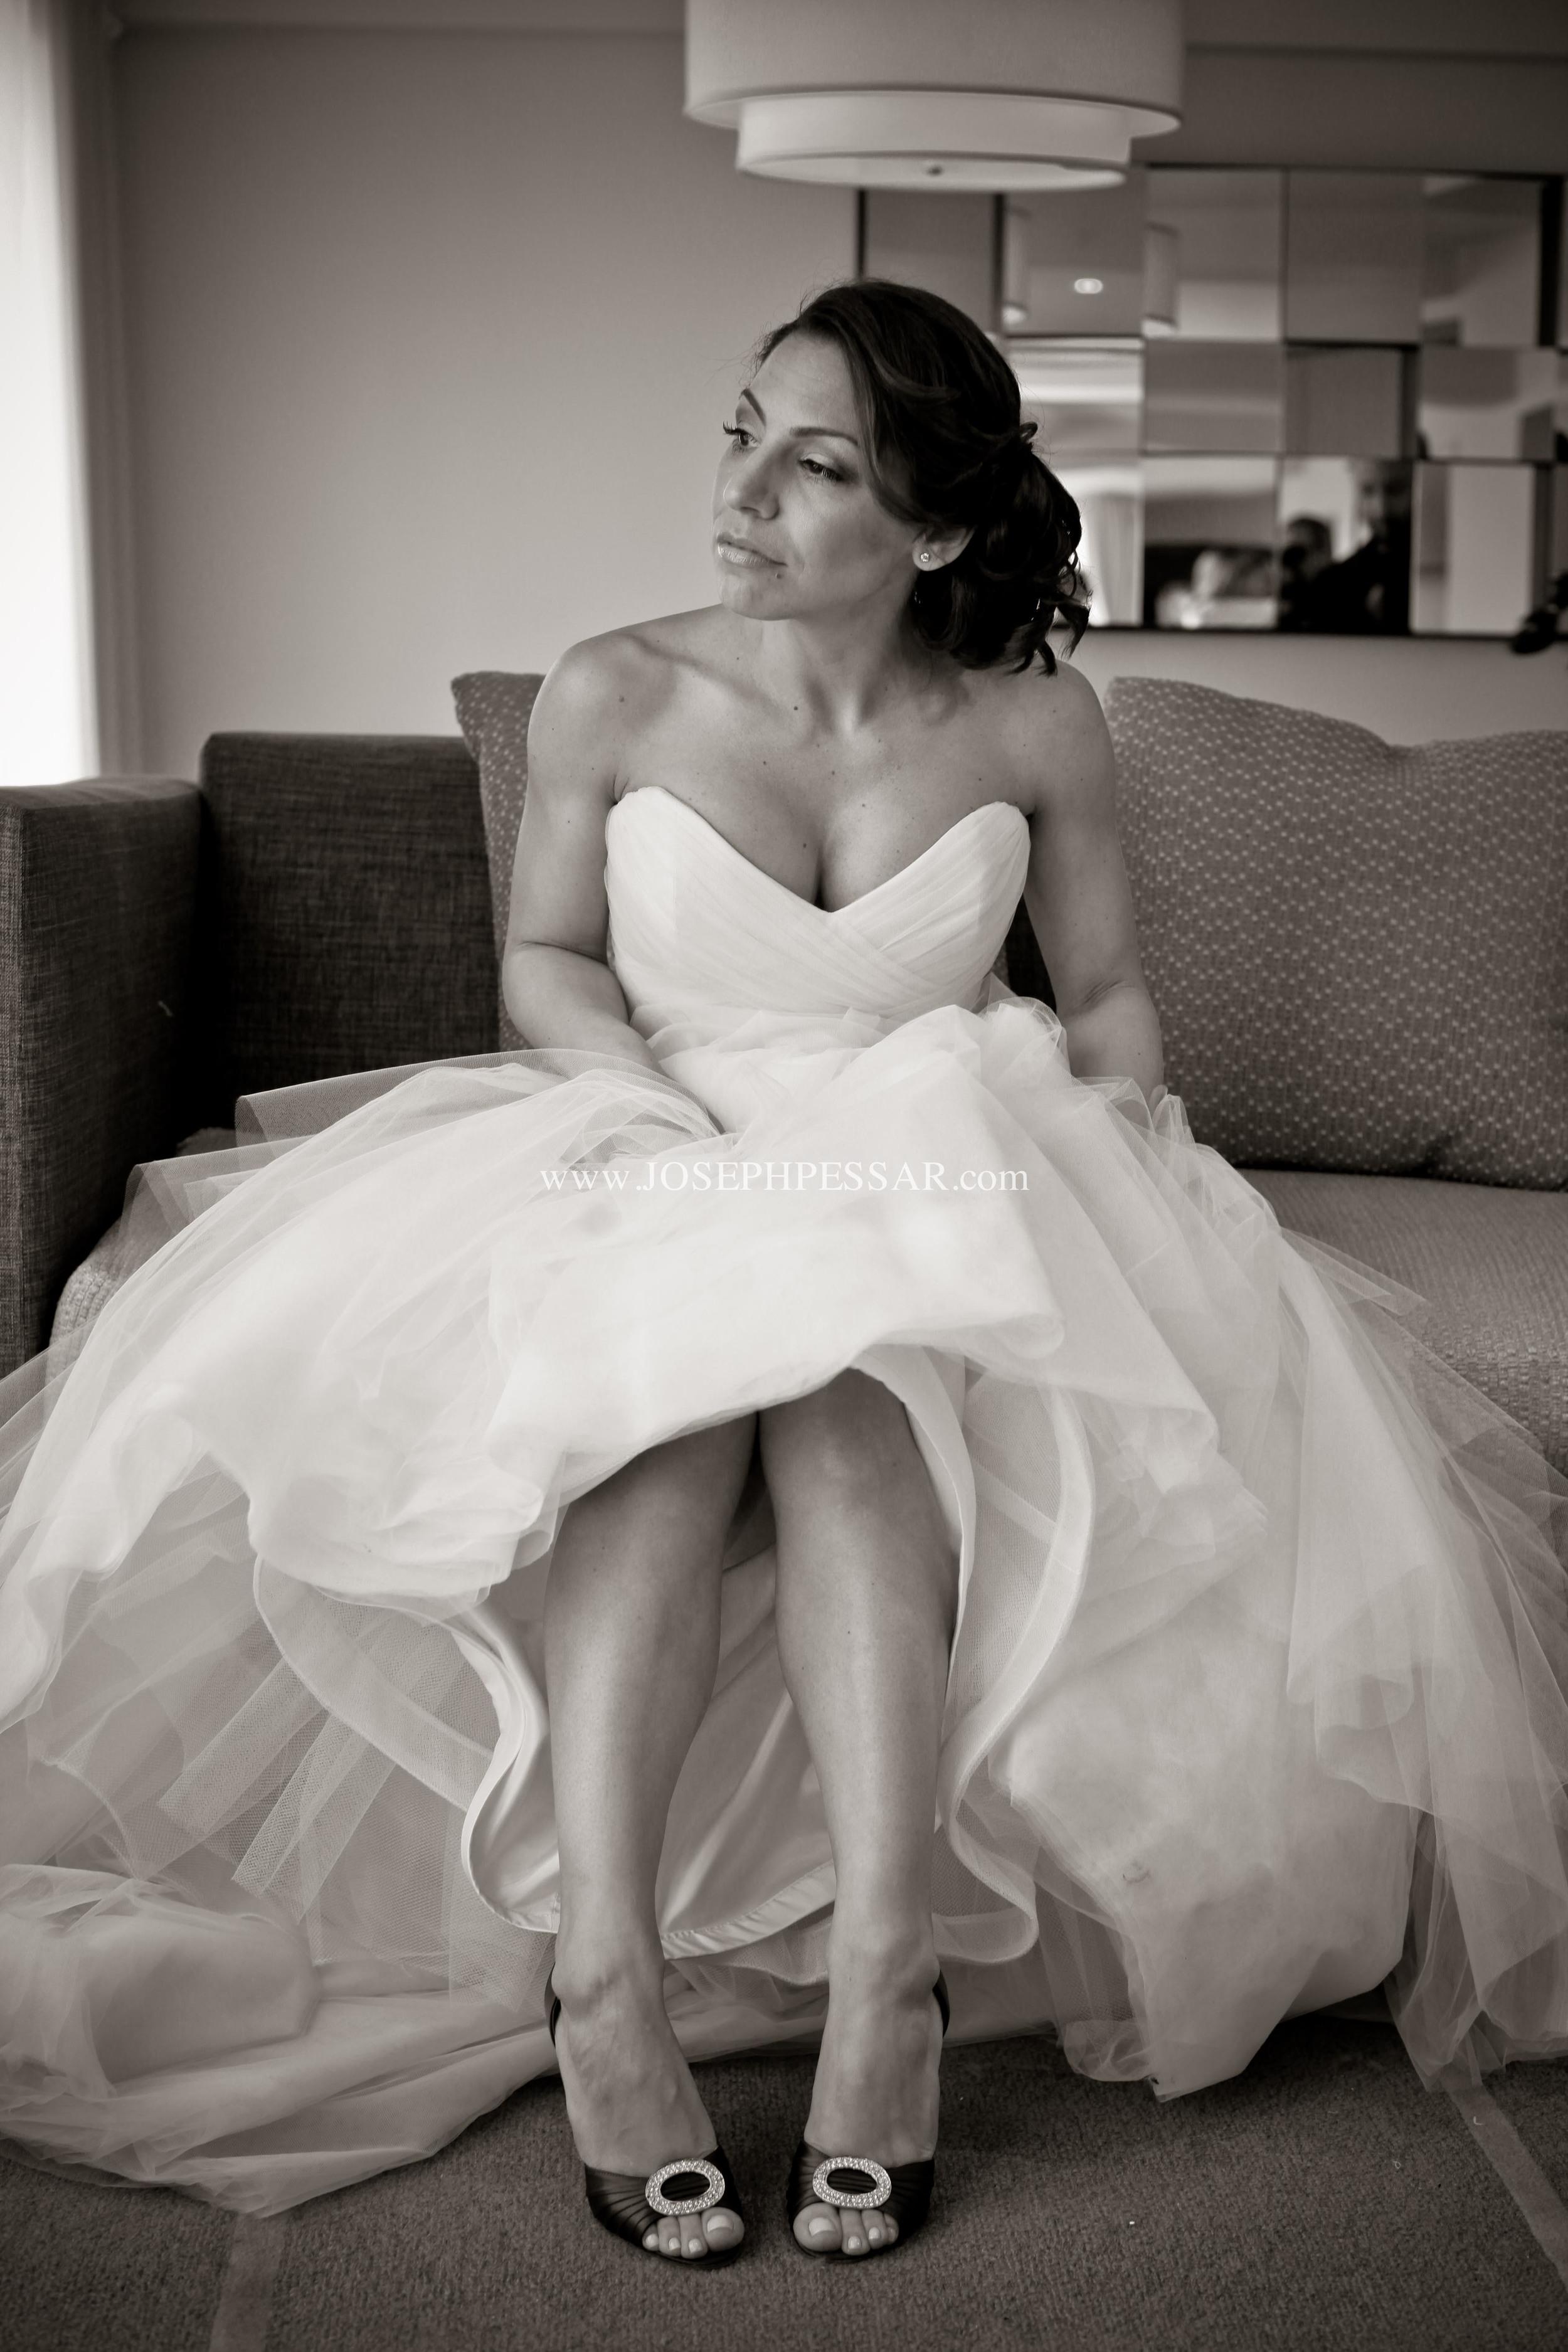 nyc_wedding_photographer0009.jpg